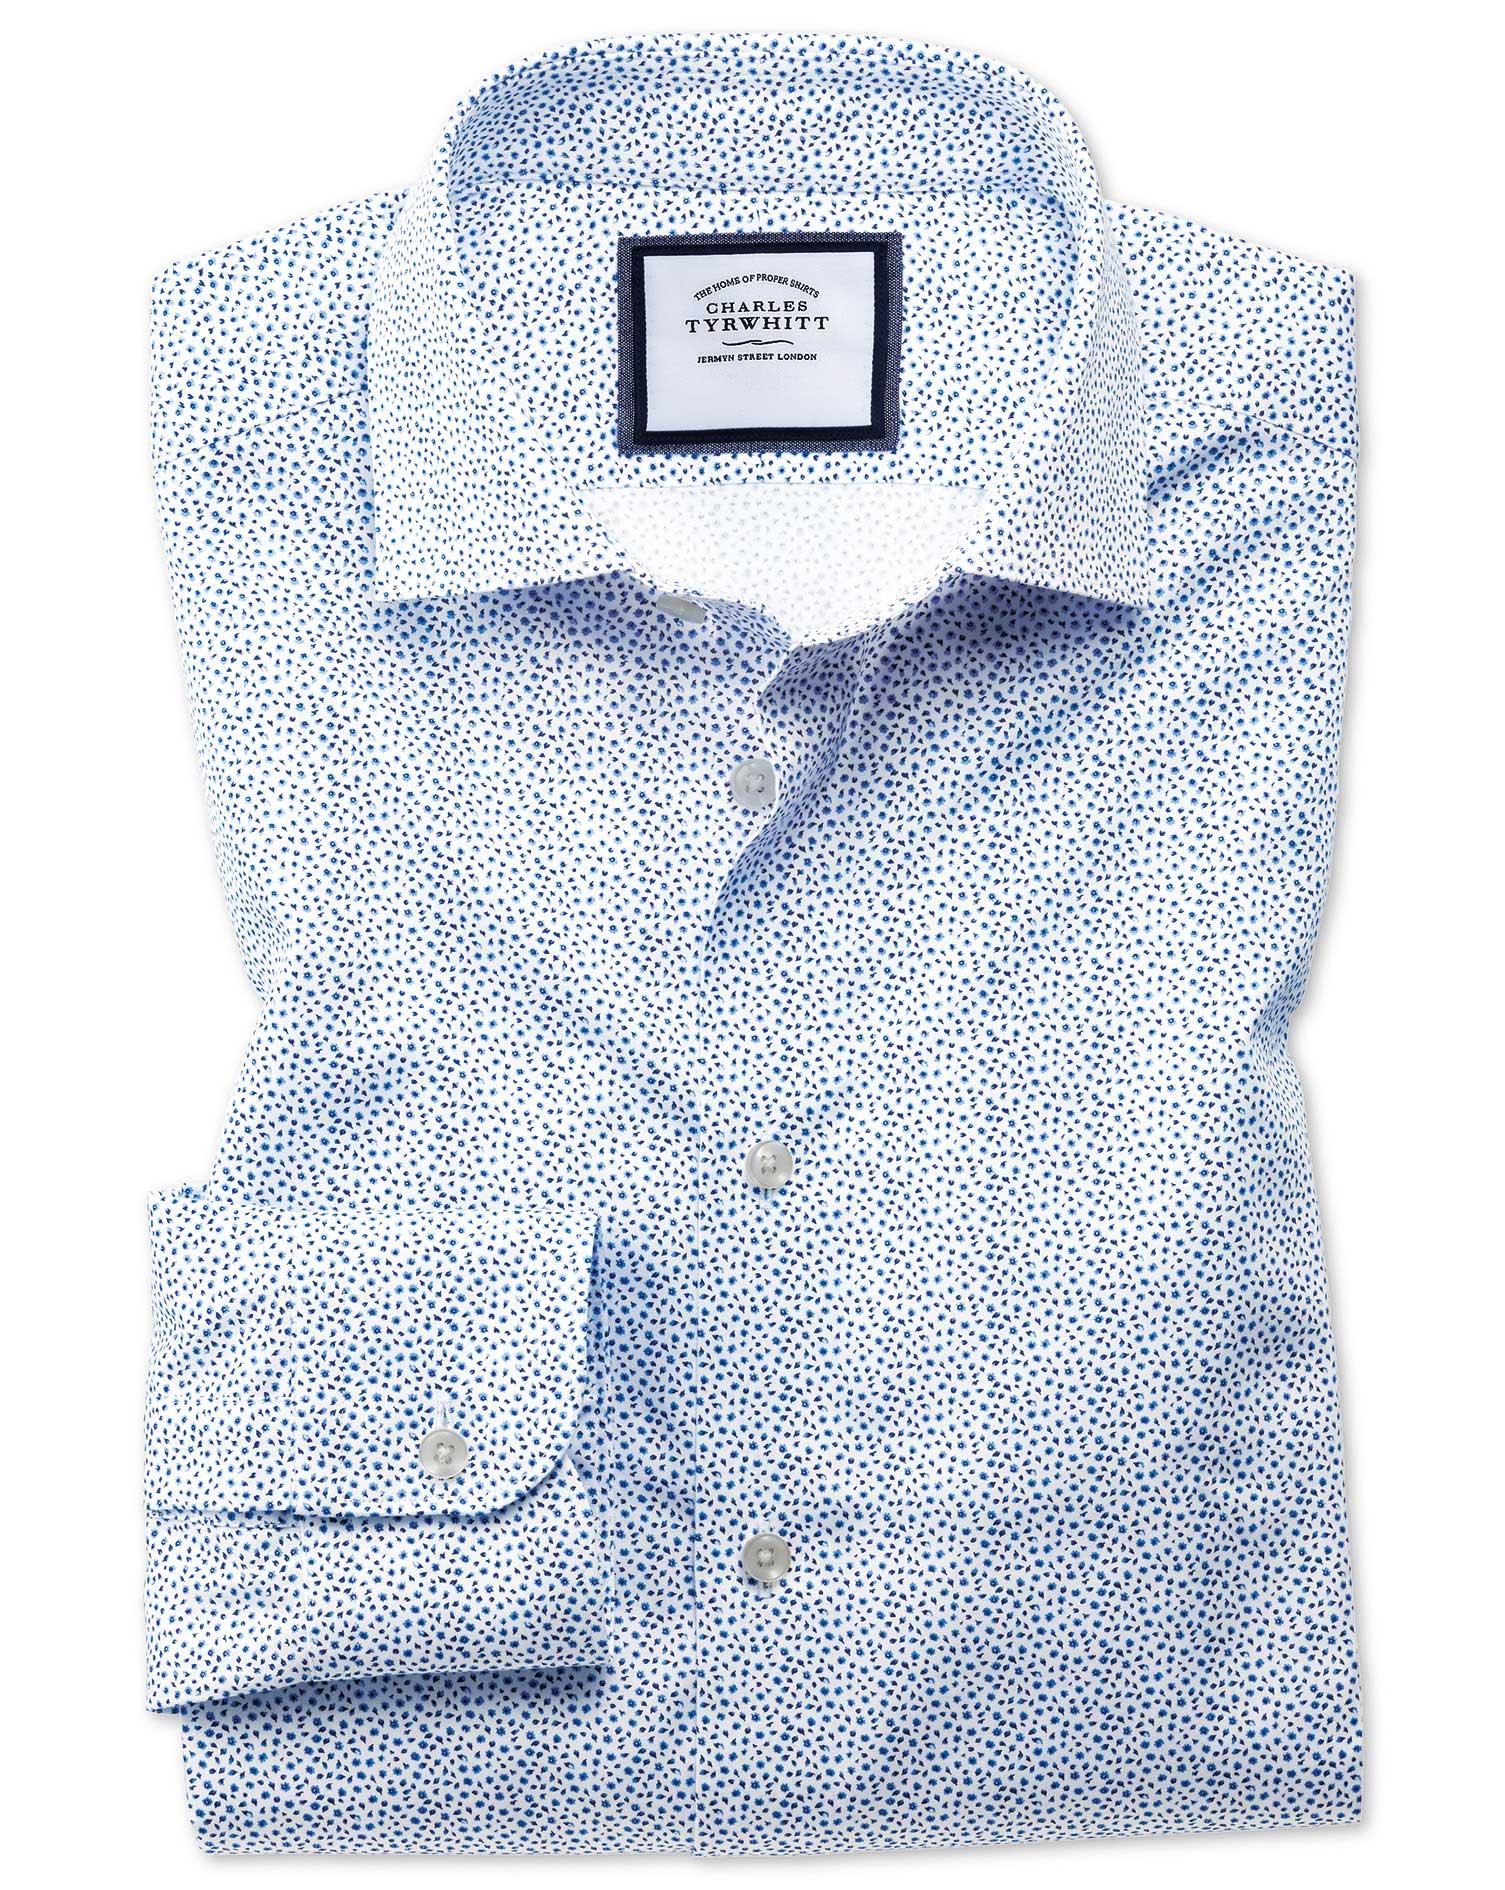 Slim Fit Semi-Cutaway Business Casual White and Blue Ditsy Print Cotton Formal Shirt Single Cuff Siz